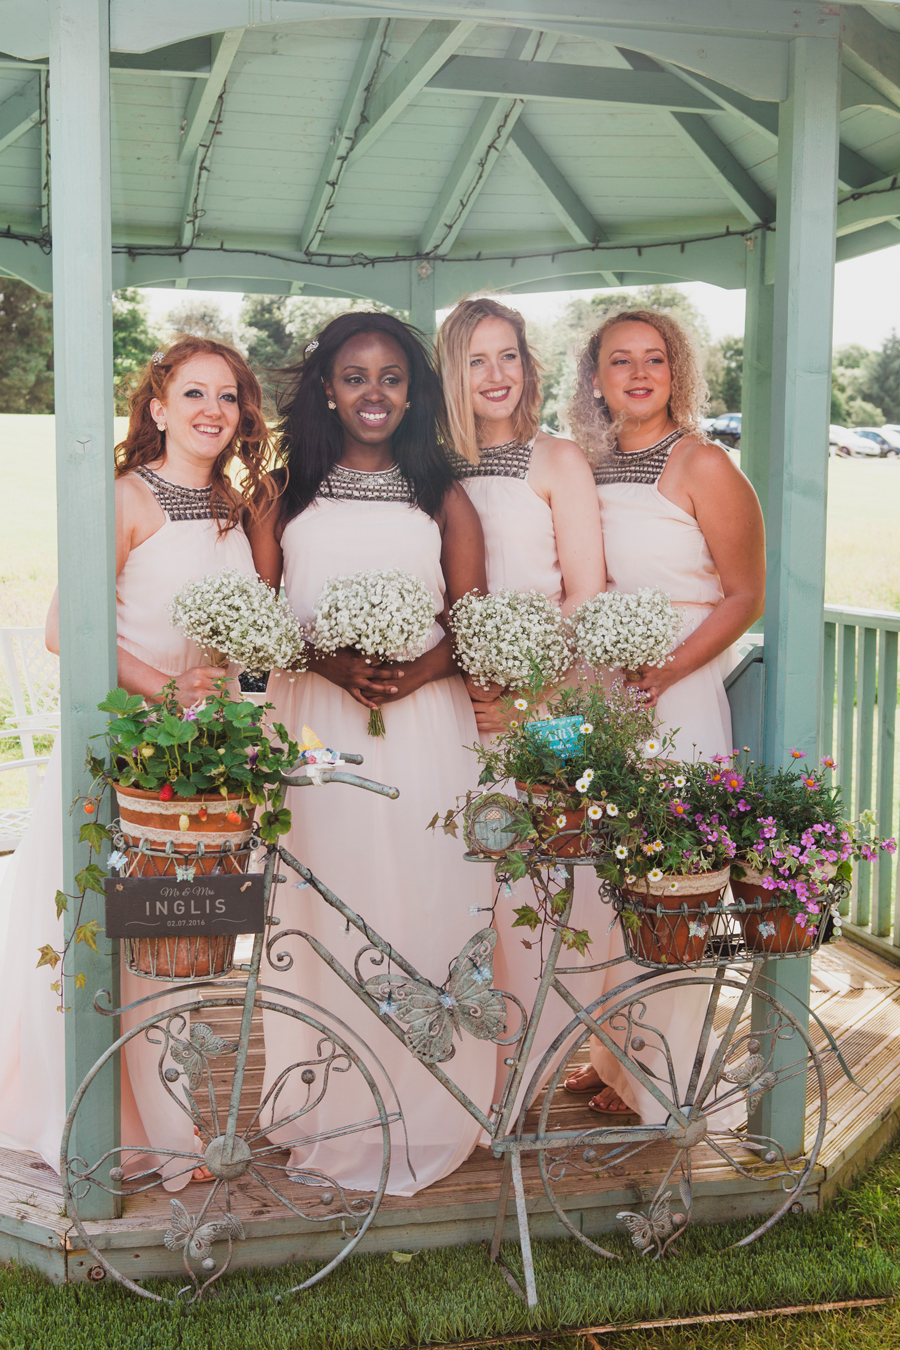 029-bridesmaids-edinburgh.jpg